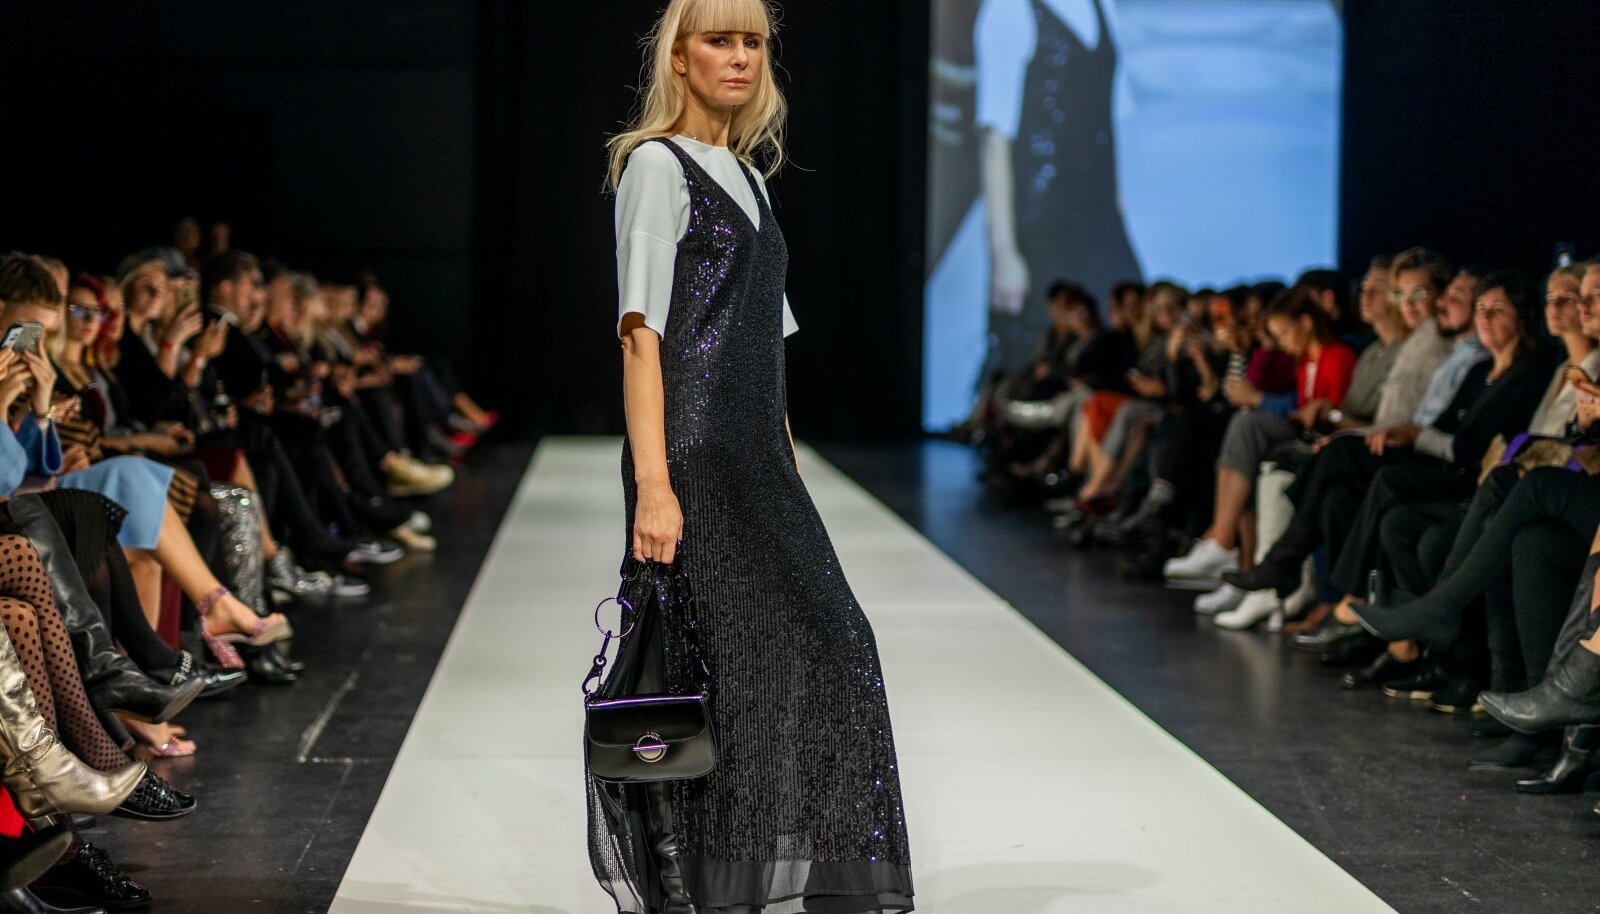 Tallinn Fashion Week 2019, Ivo Nikkolo 25